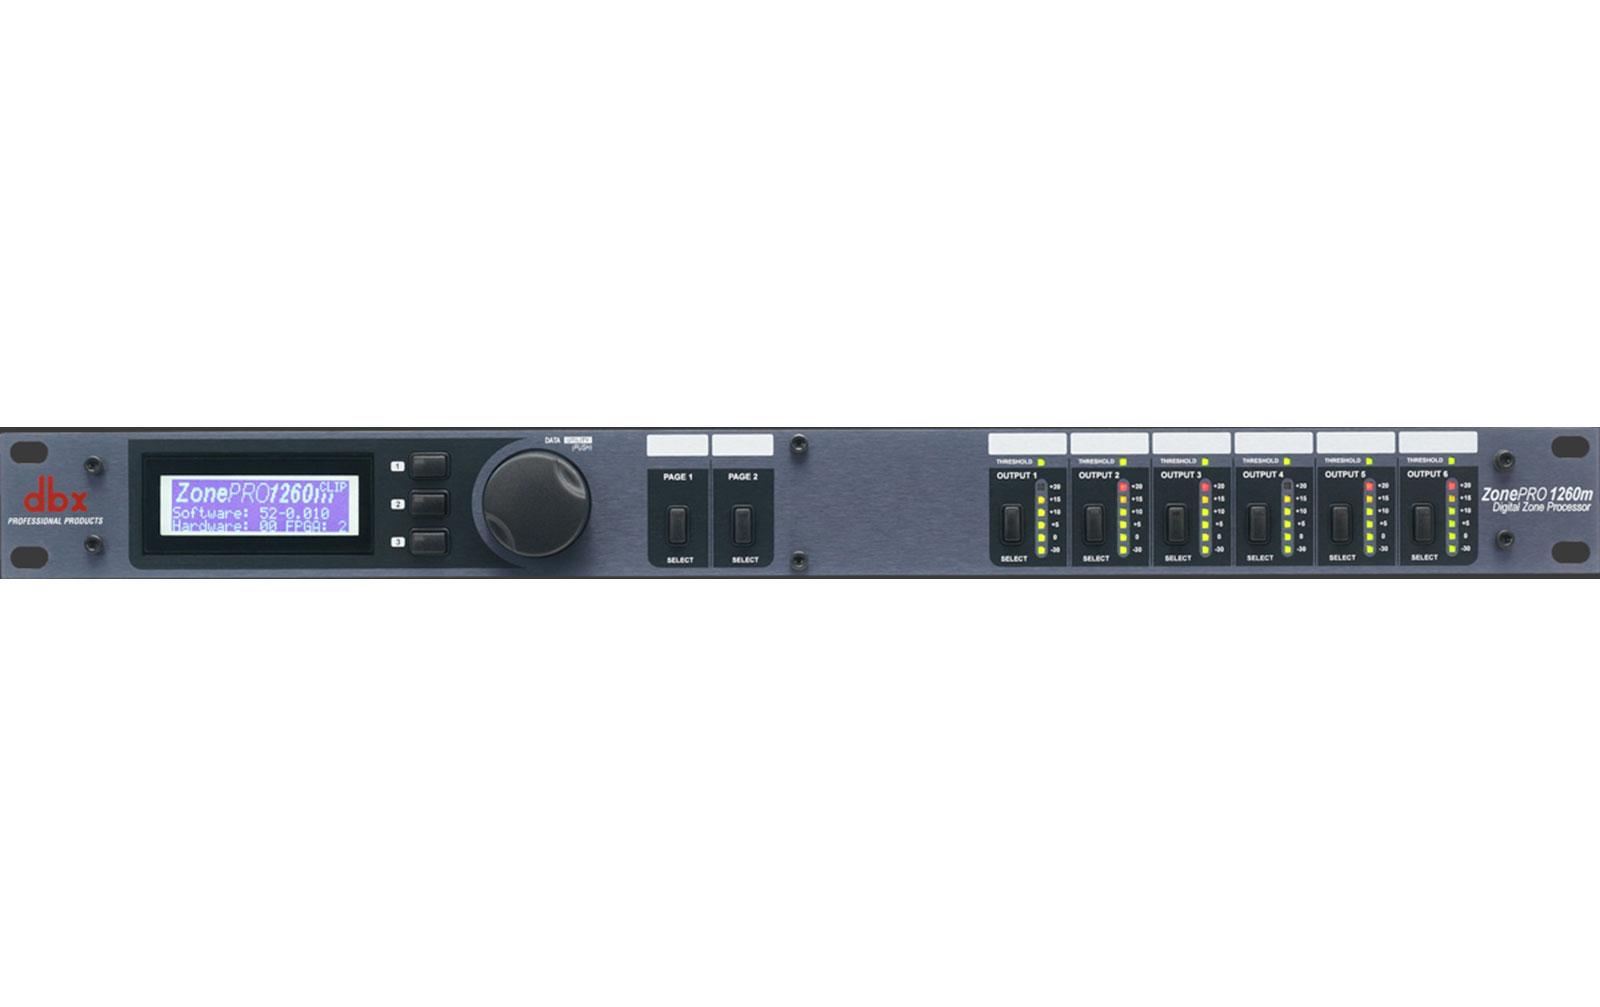 dbx-zonepro-1260m-zonenmix-matrix-system